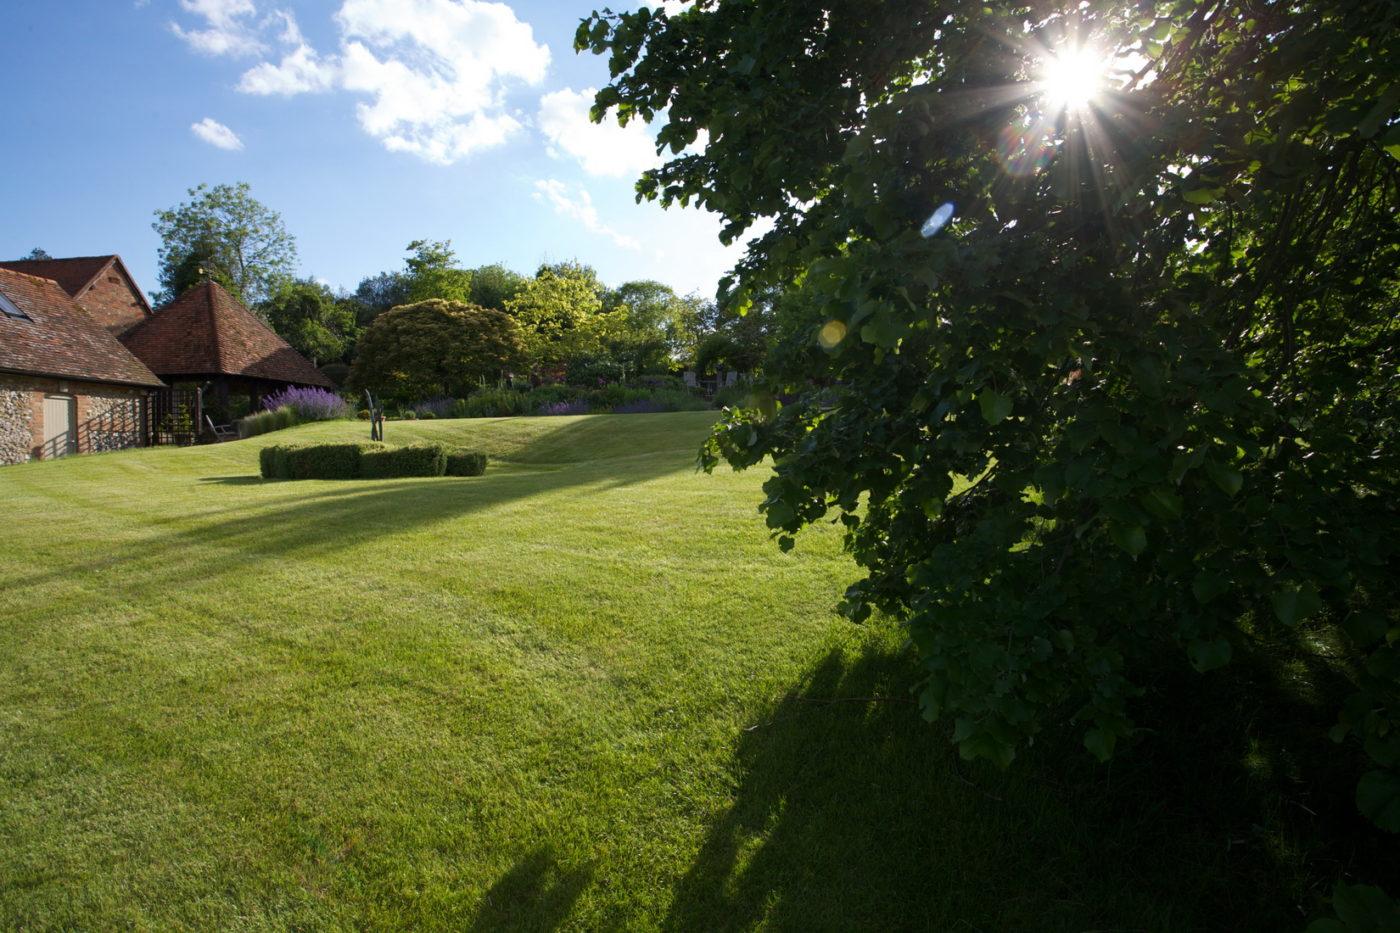 Jonathan Snow landscape and garden designer transformed a field into a beautiful garden in Buckinghamshire.